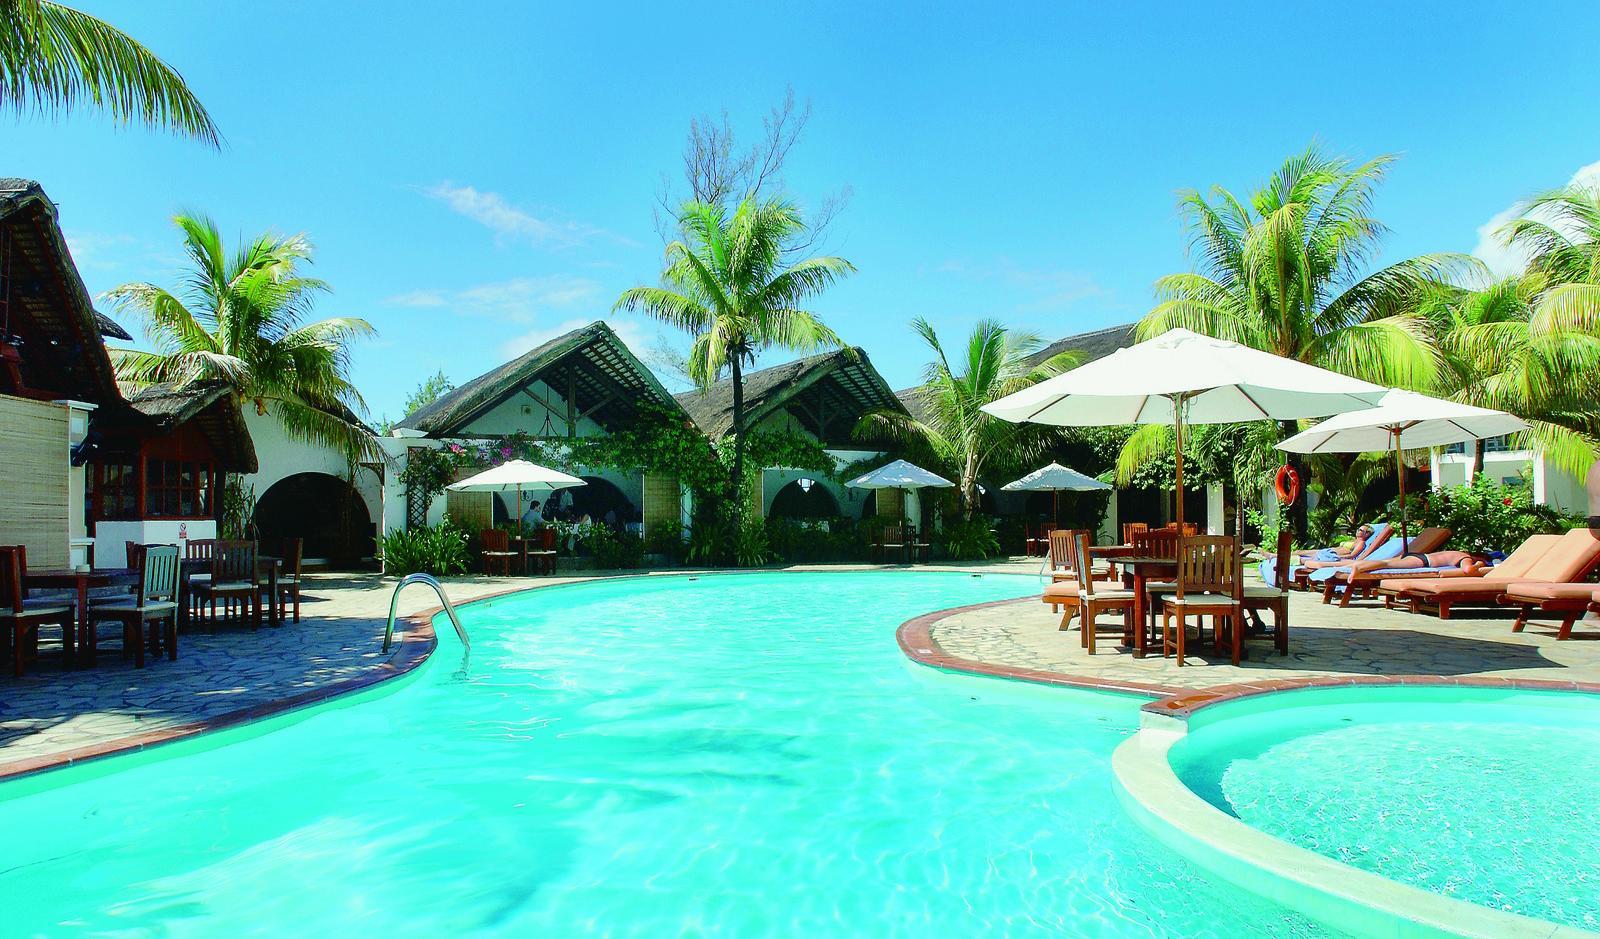 Veranda Palmar Beach Hotel Ile Maurice